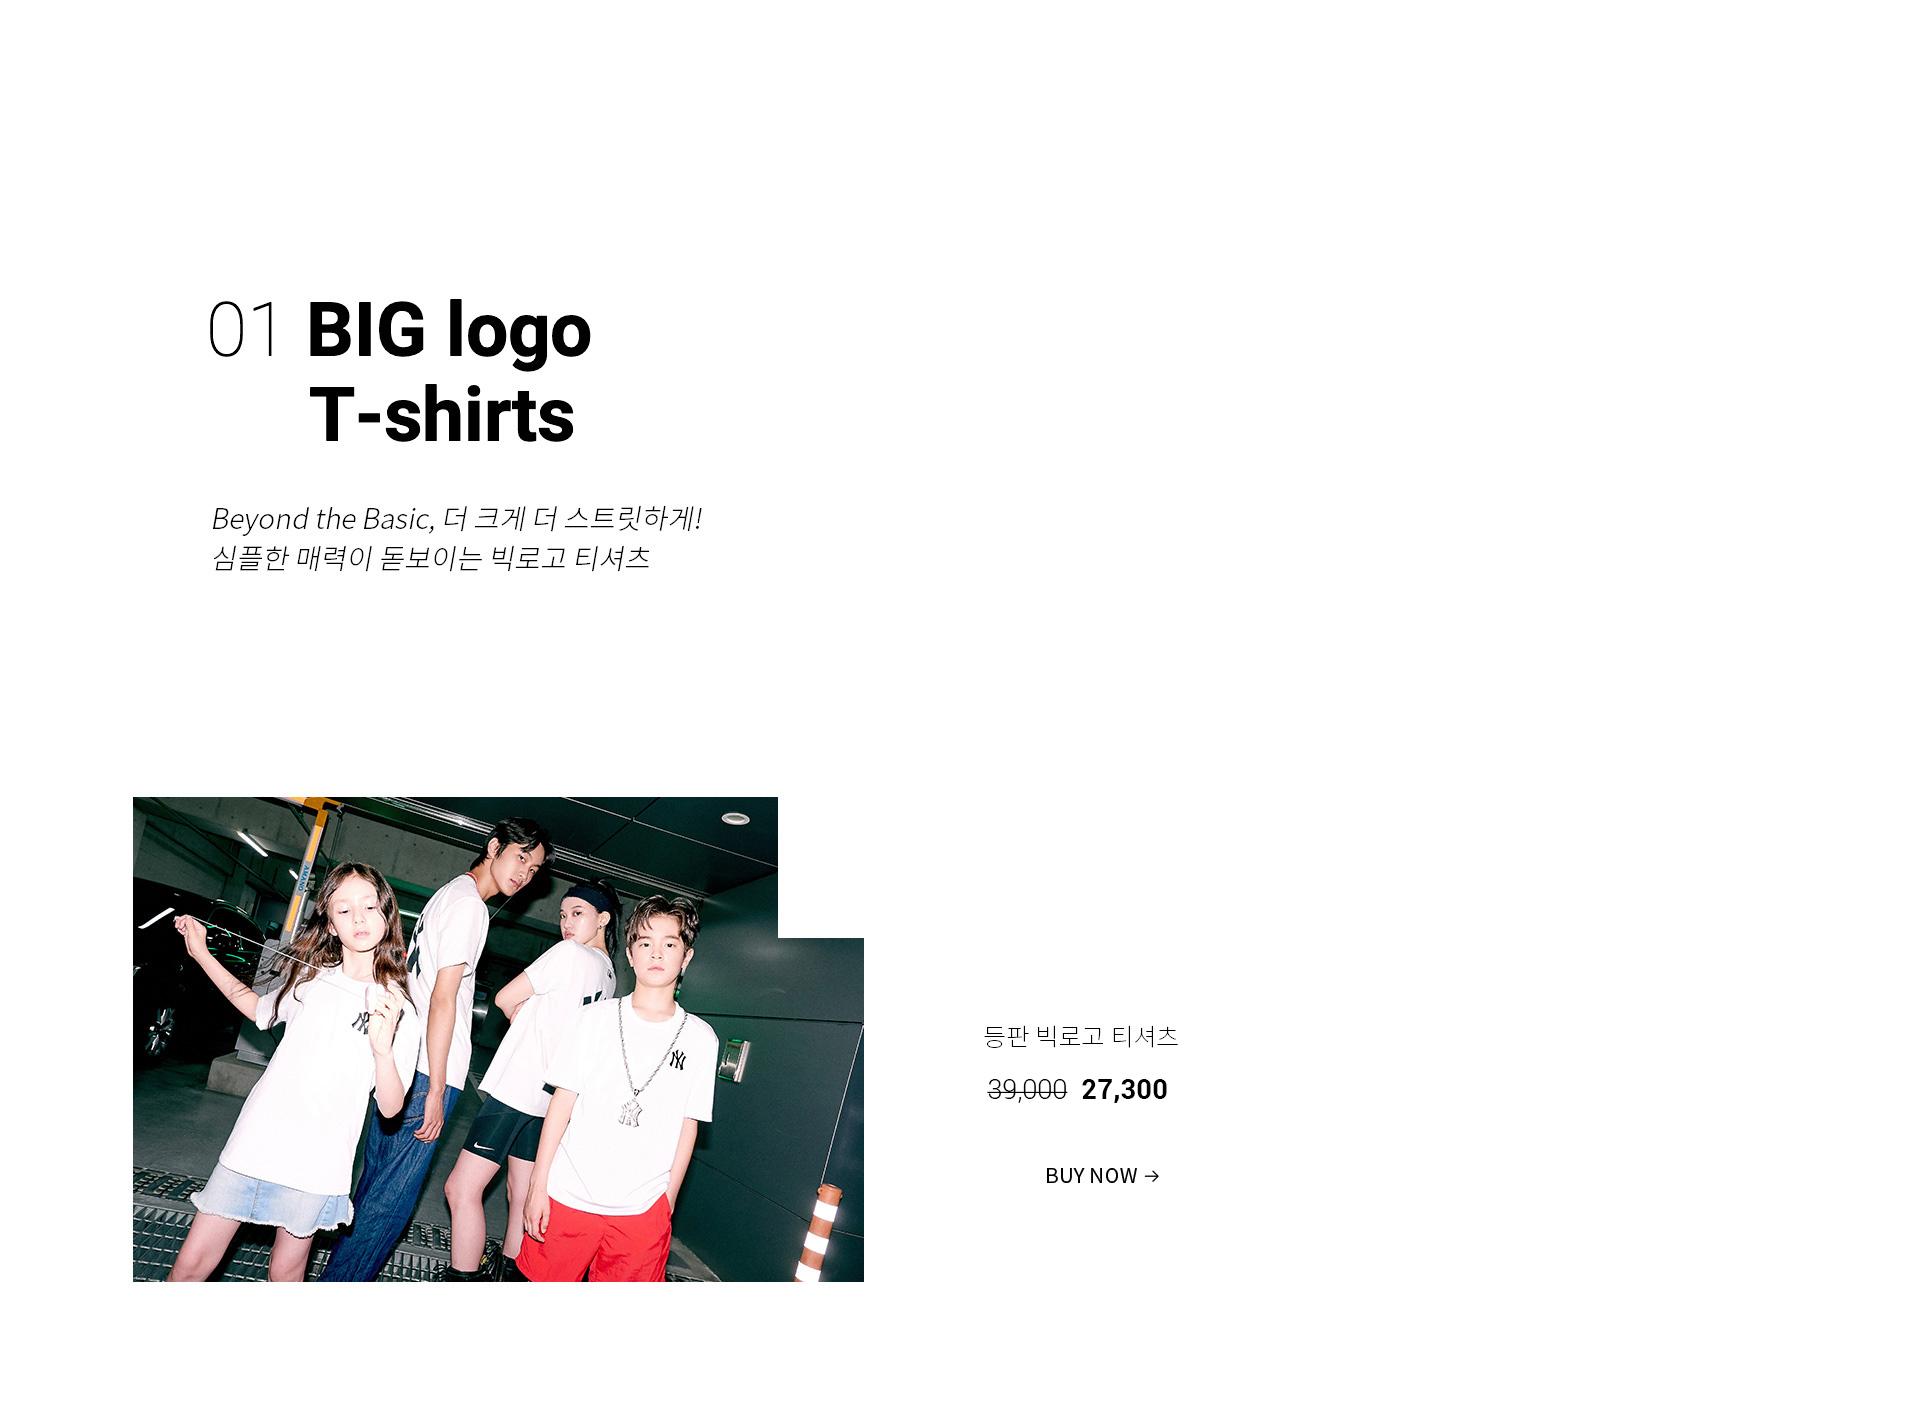 01 BIG logo T-shirts Beyond the Basic, 더 크게 더 스트릿하게! 심플한 매력이 돋보이는 빅로고 티셔츠